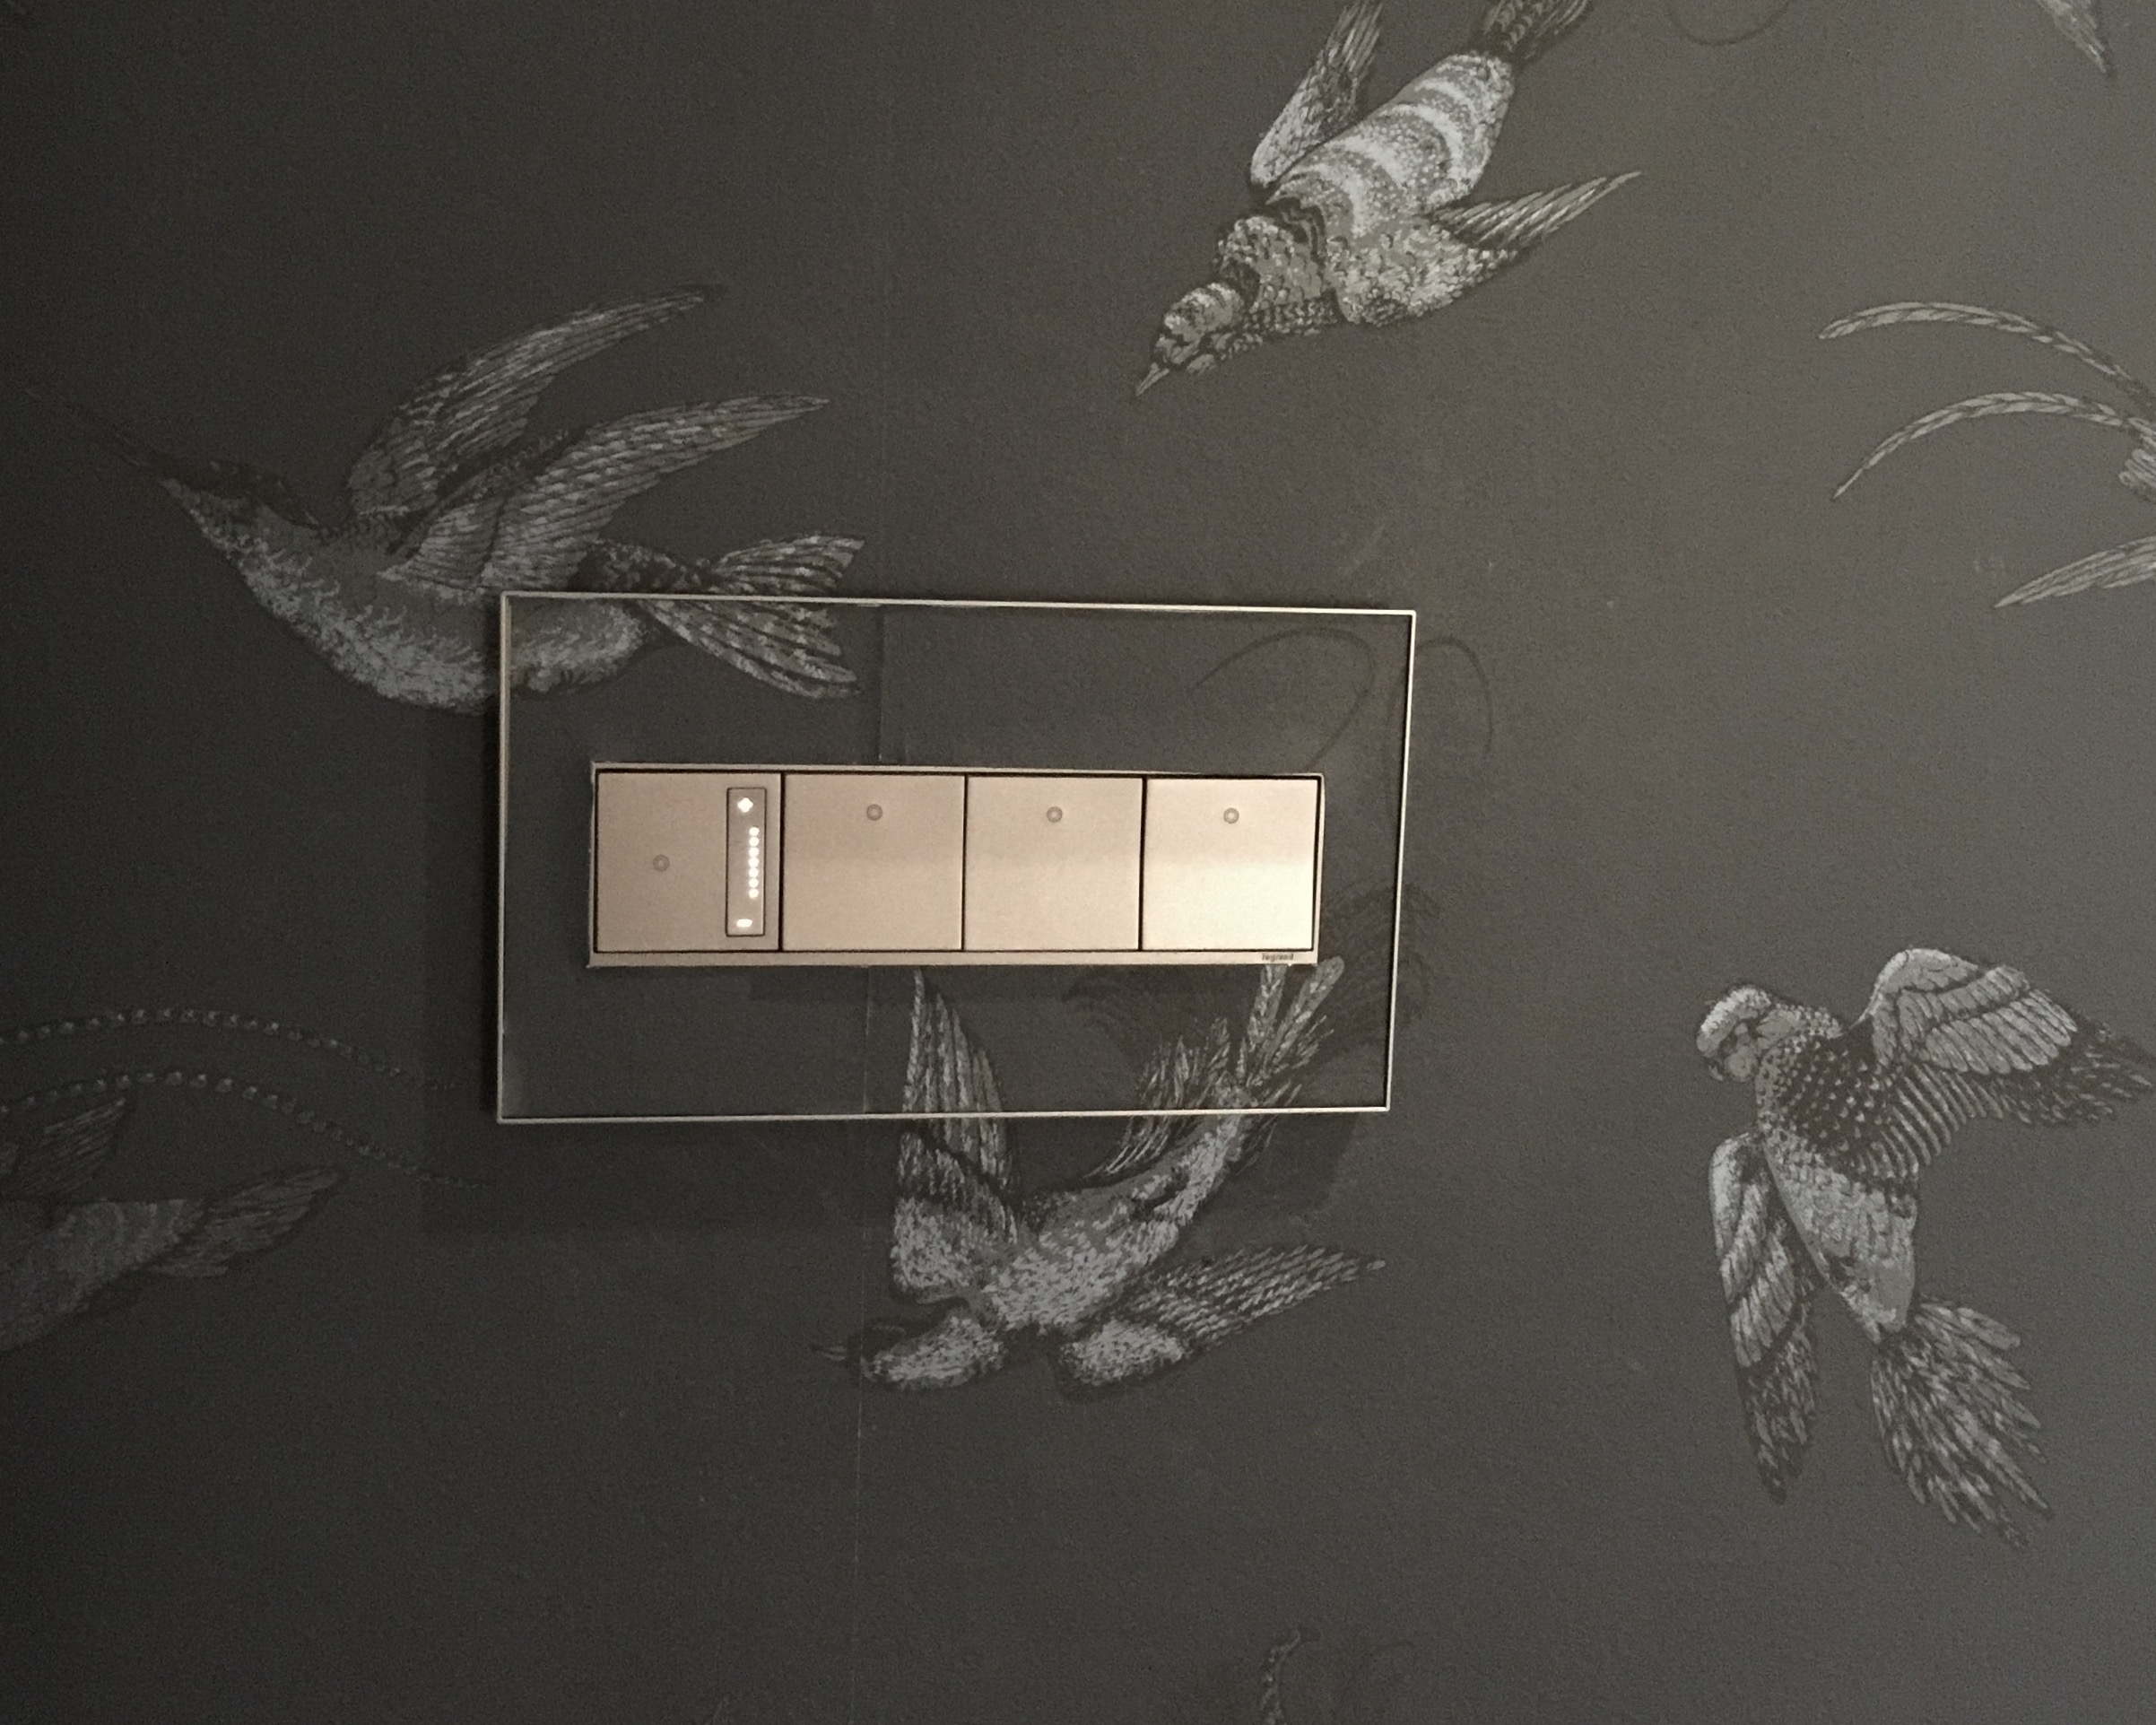 Legrand Adorne switches on wallpaper